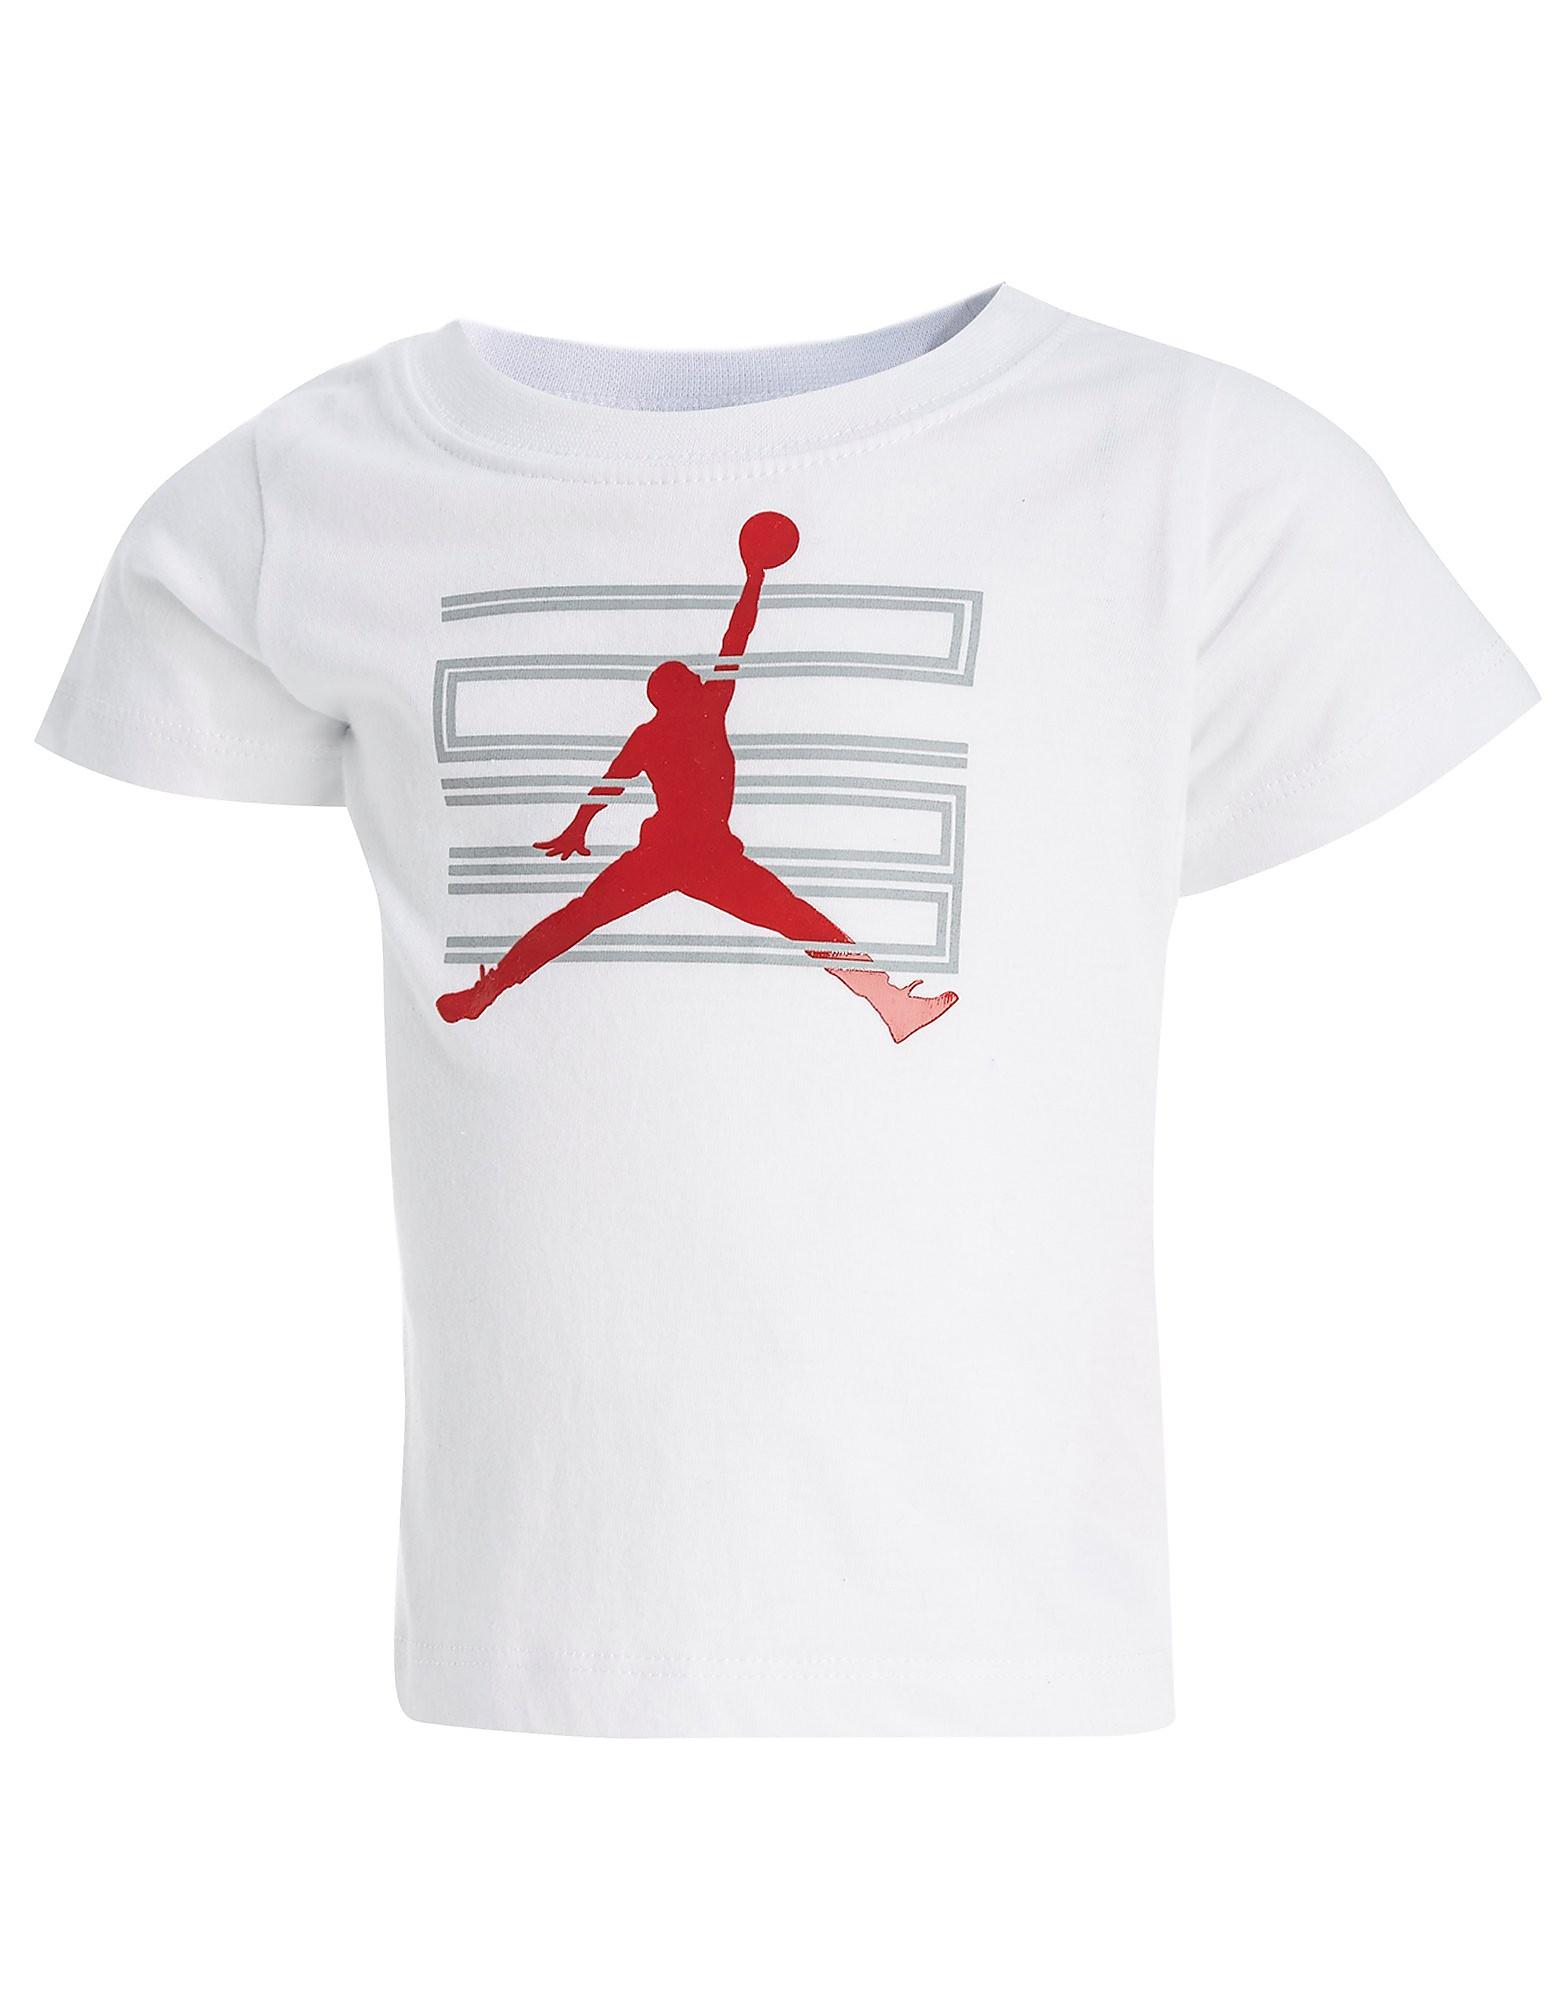 Jordan Air 11 T-Shirt Kleinkind